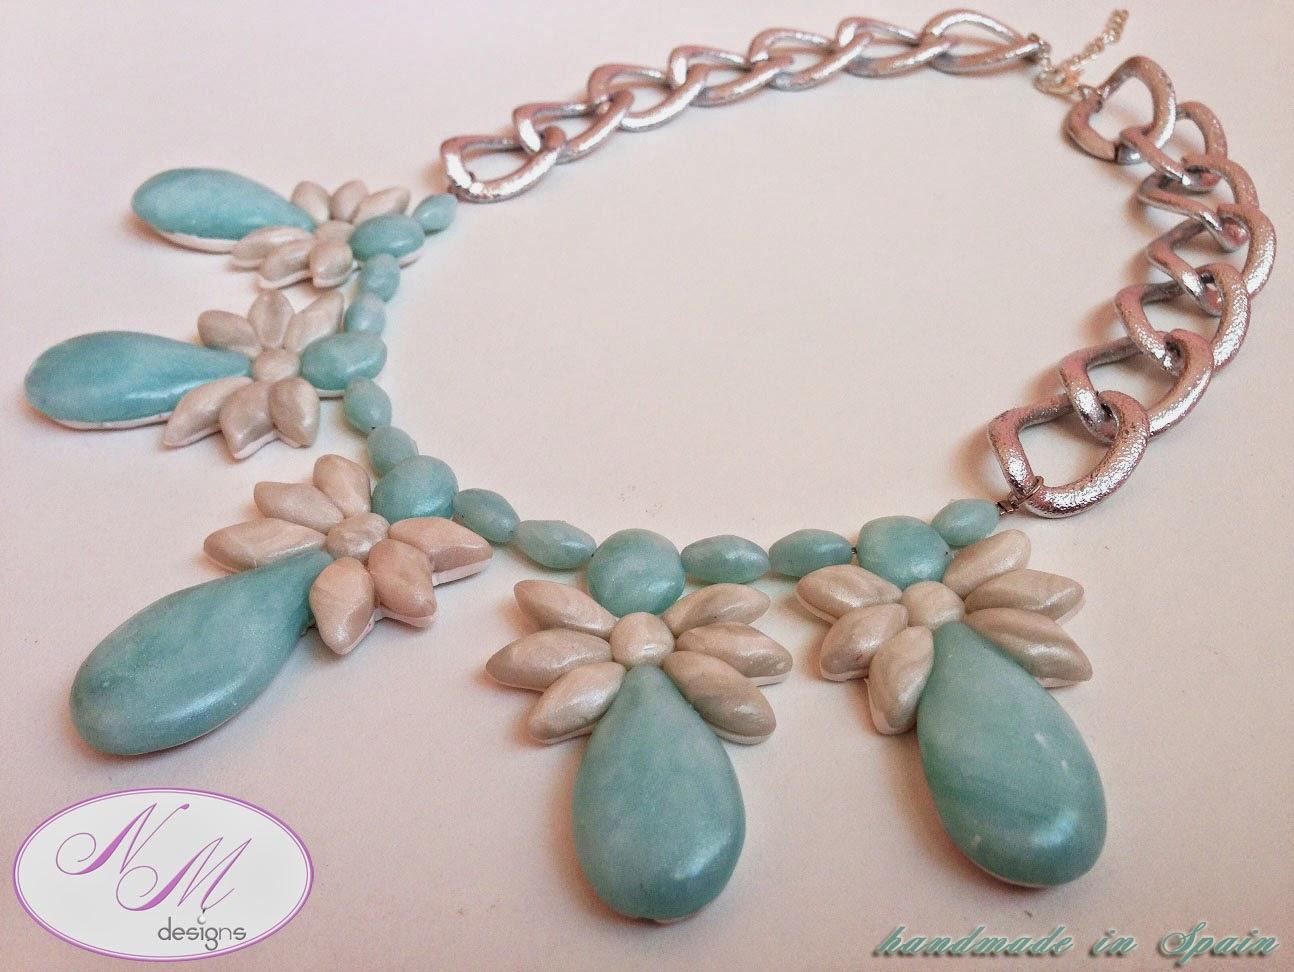 Collar/Necklace NM Designs